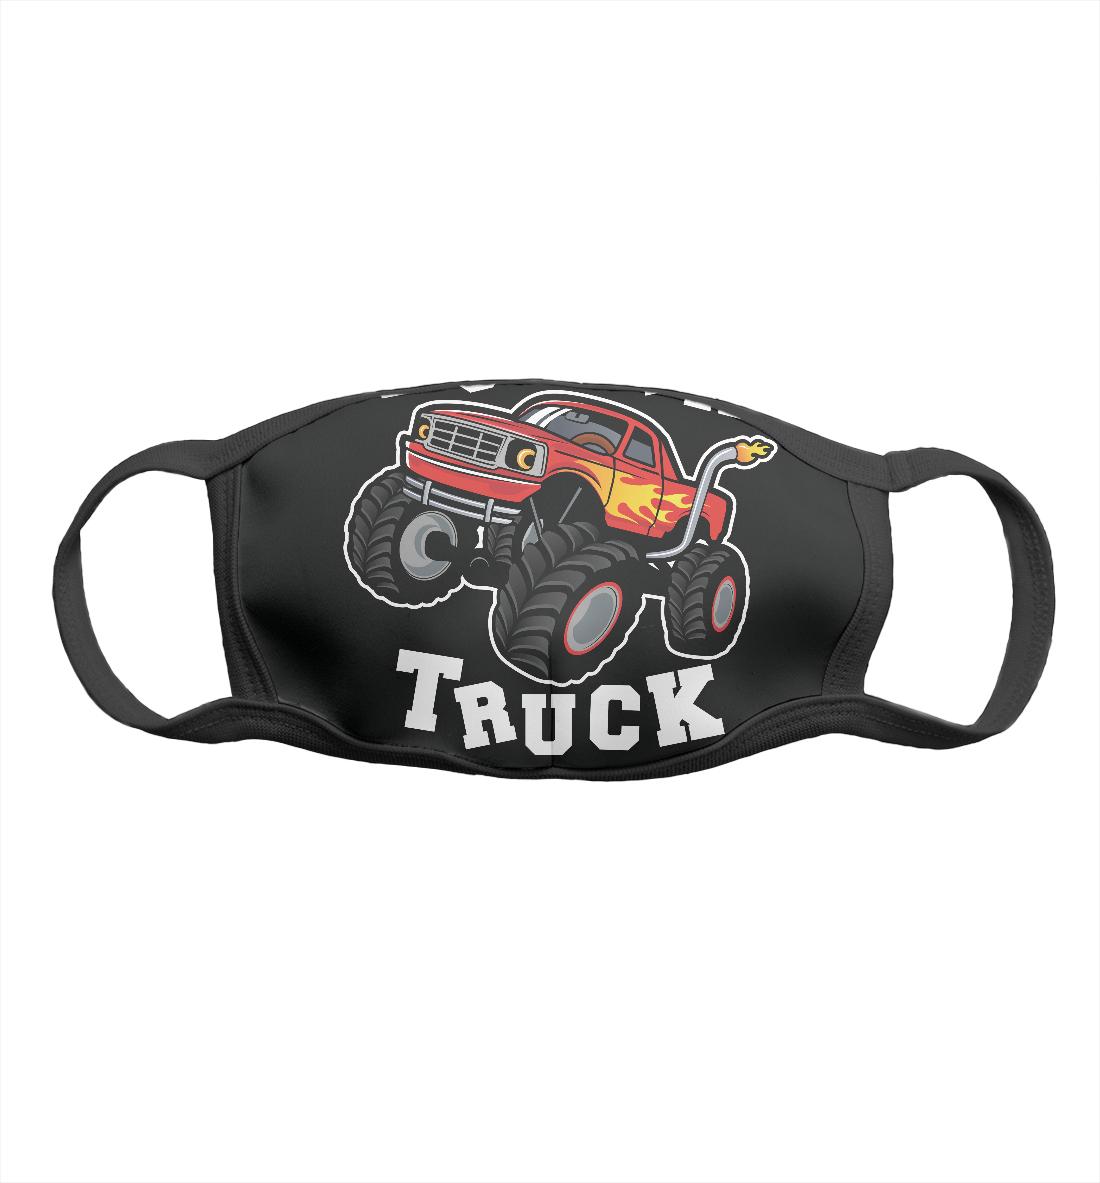 Фото - Monster truck truck